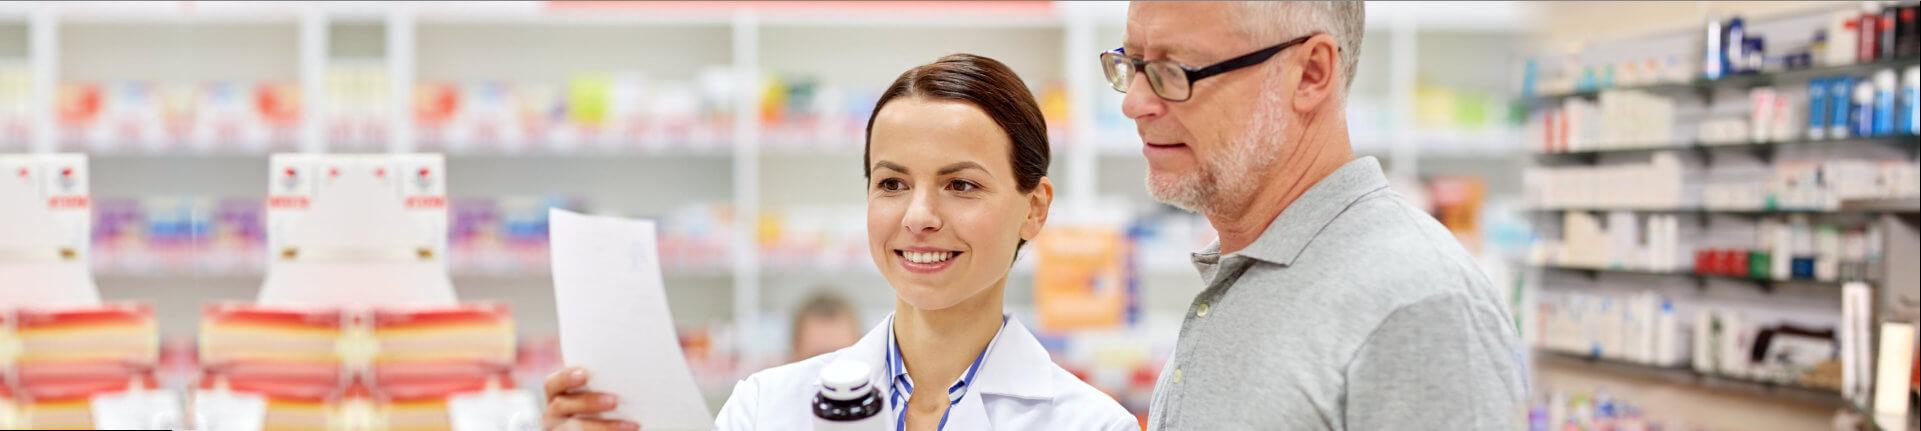 Pharmacist and elderly man buying drug at pharmacy